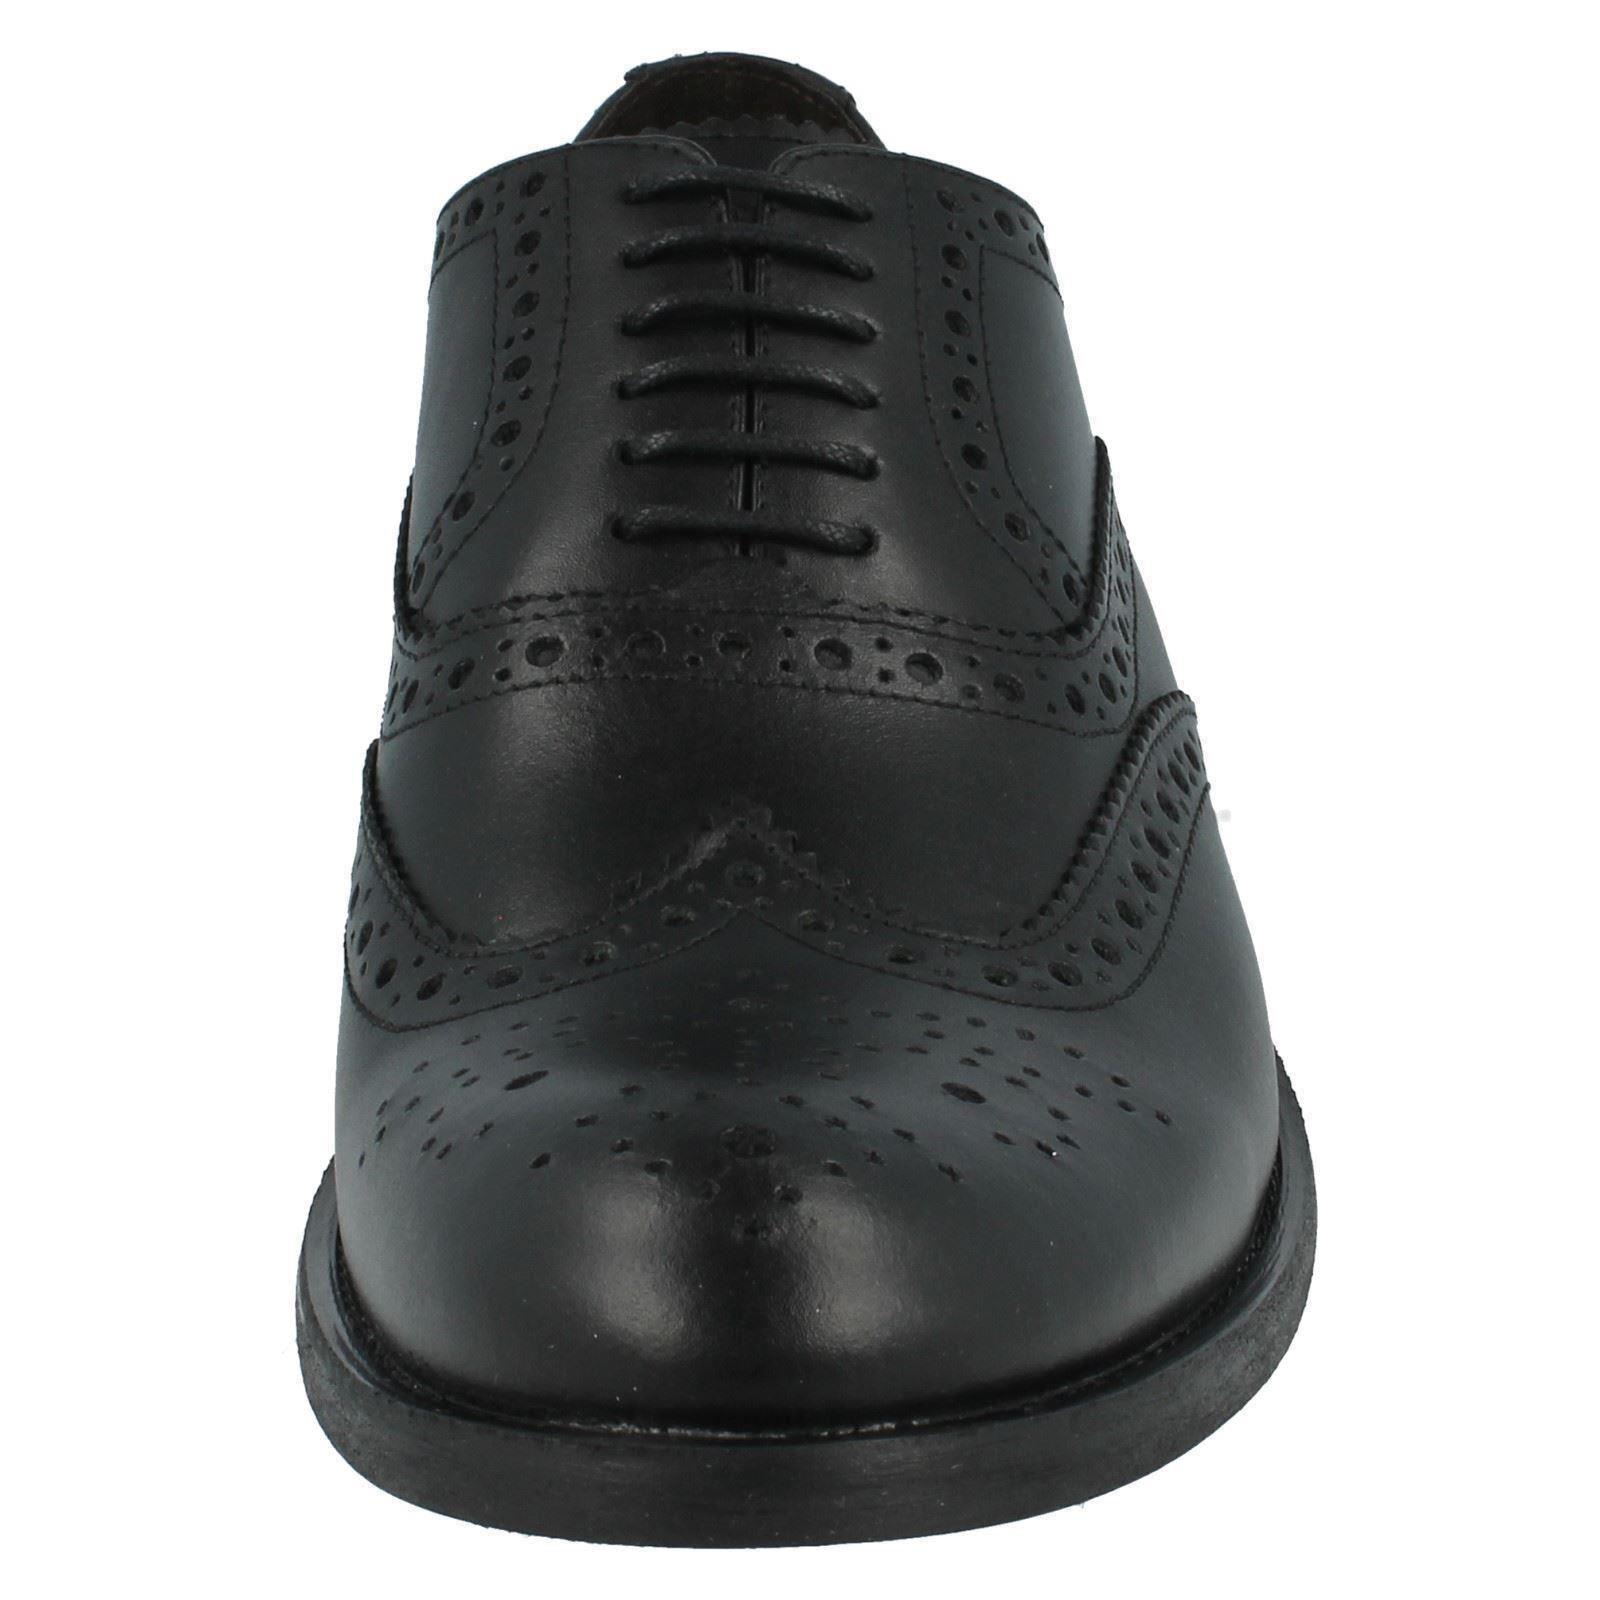 Uomo Base Up London Waxy Leather Lace Up Base Shoes  Walnut MTO 72092e